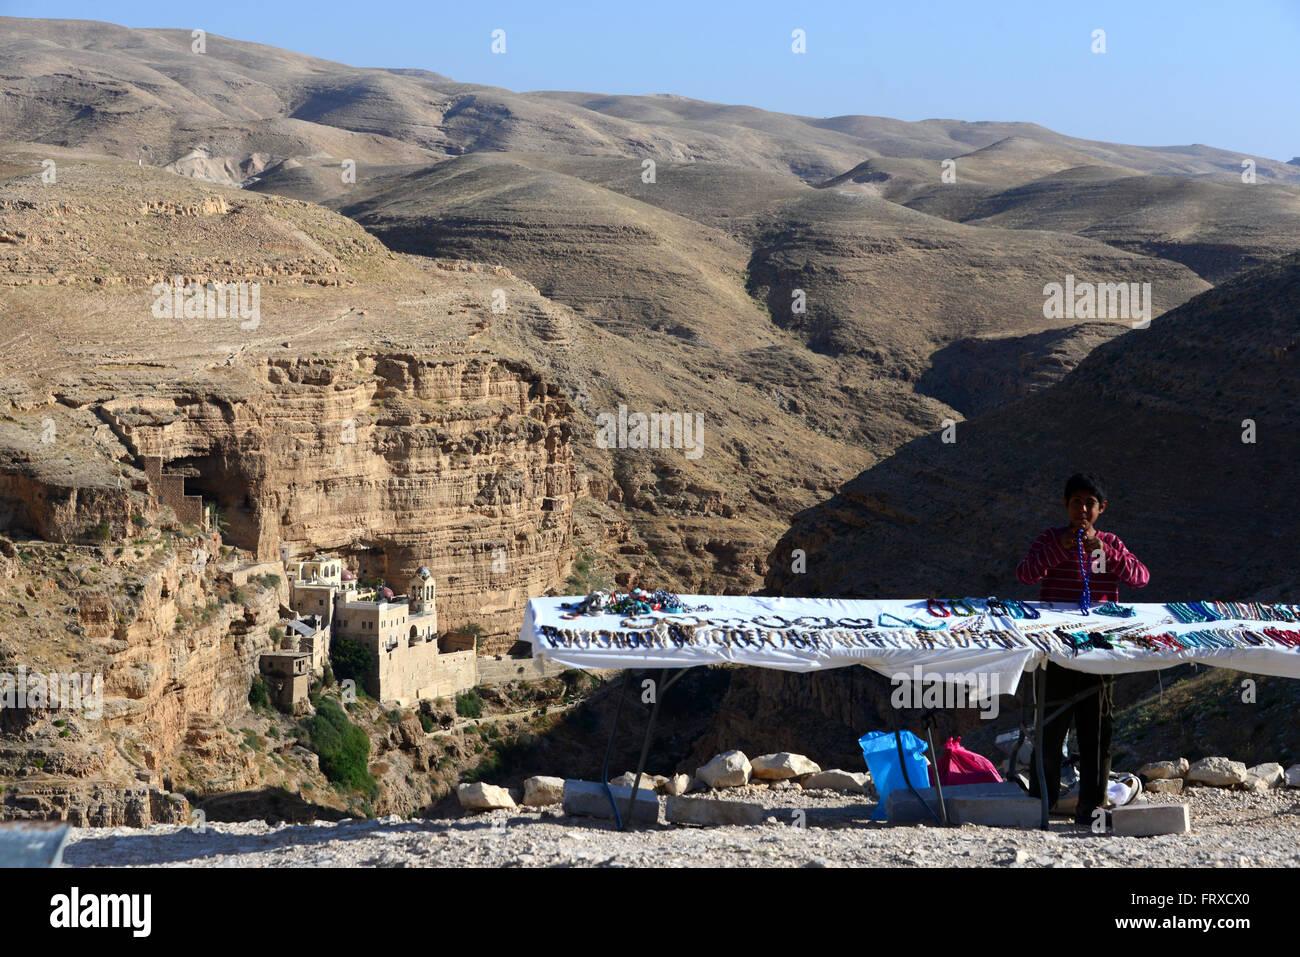 Street vendor over the St George monastary near Jericho, Palestine near Israel - Stock Image